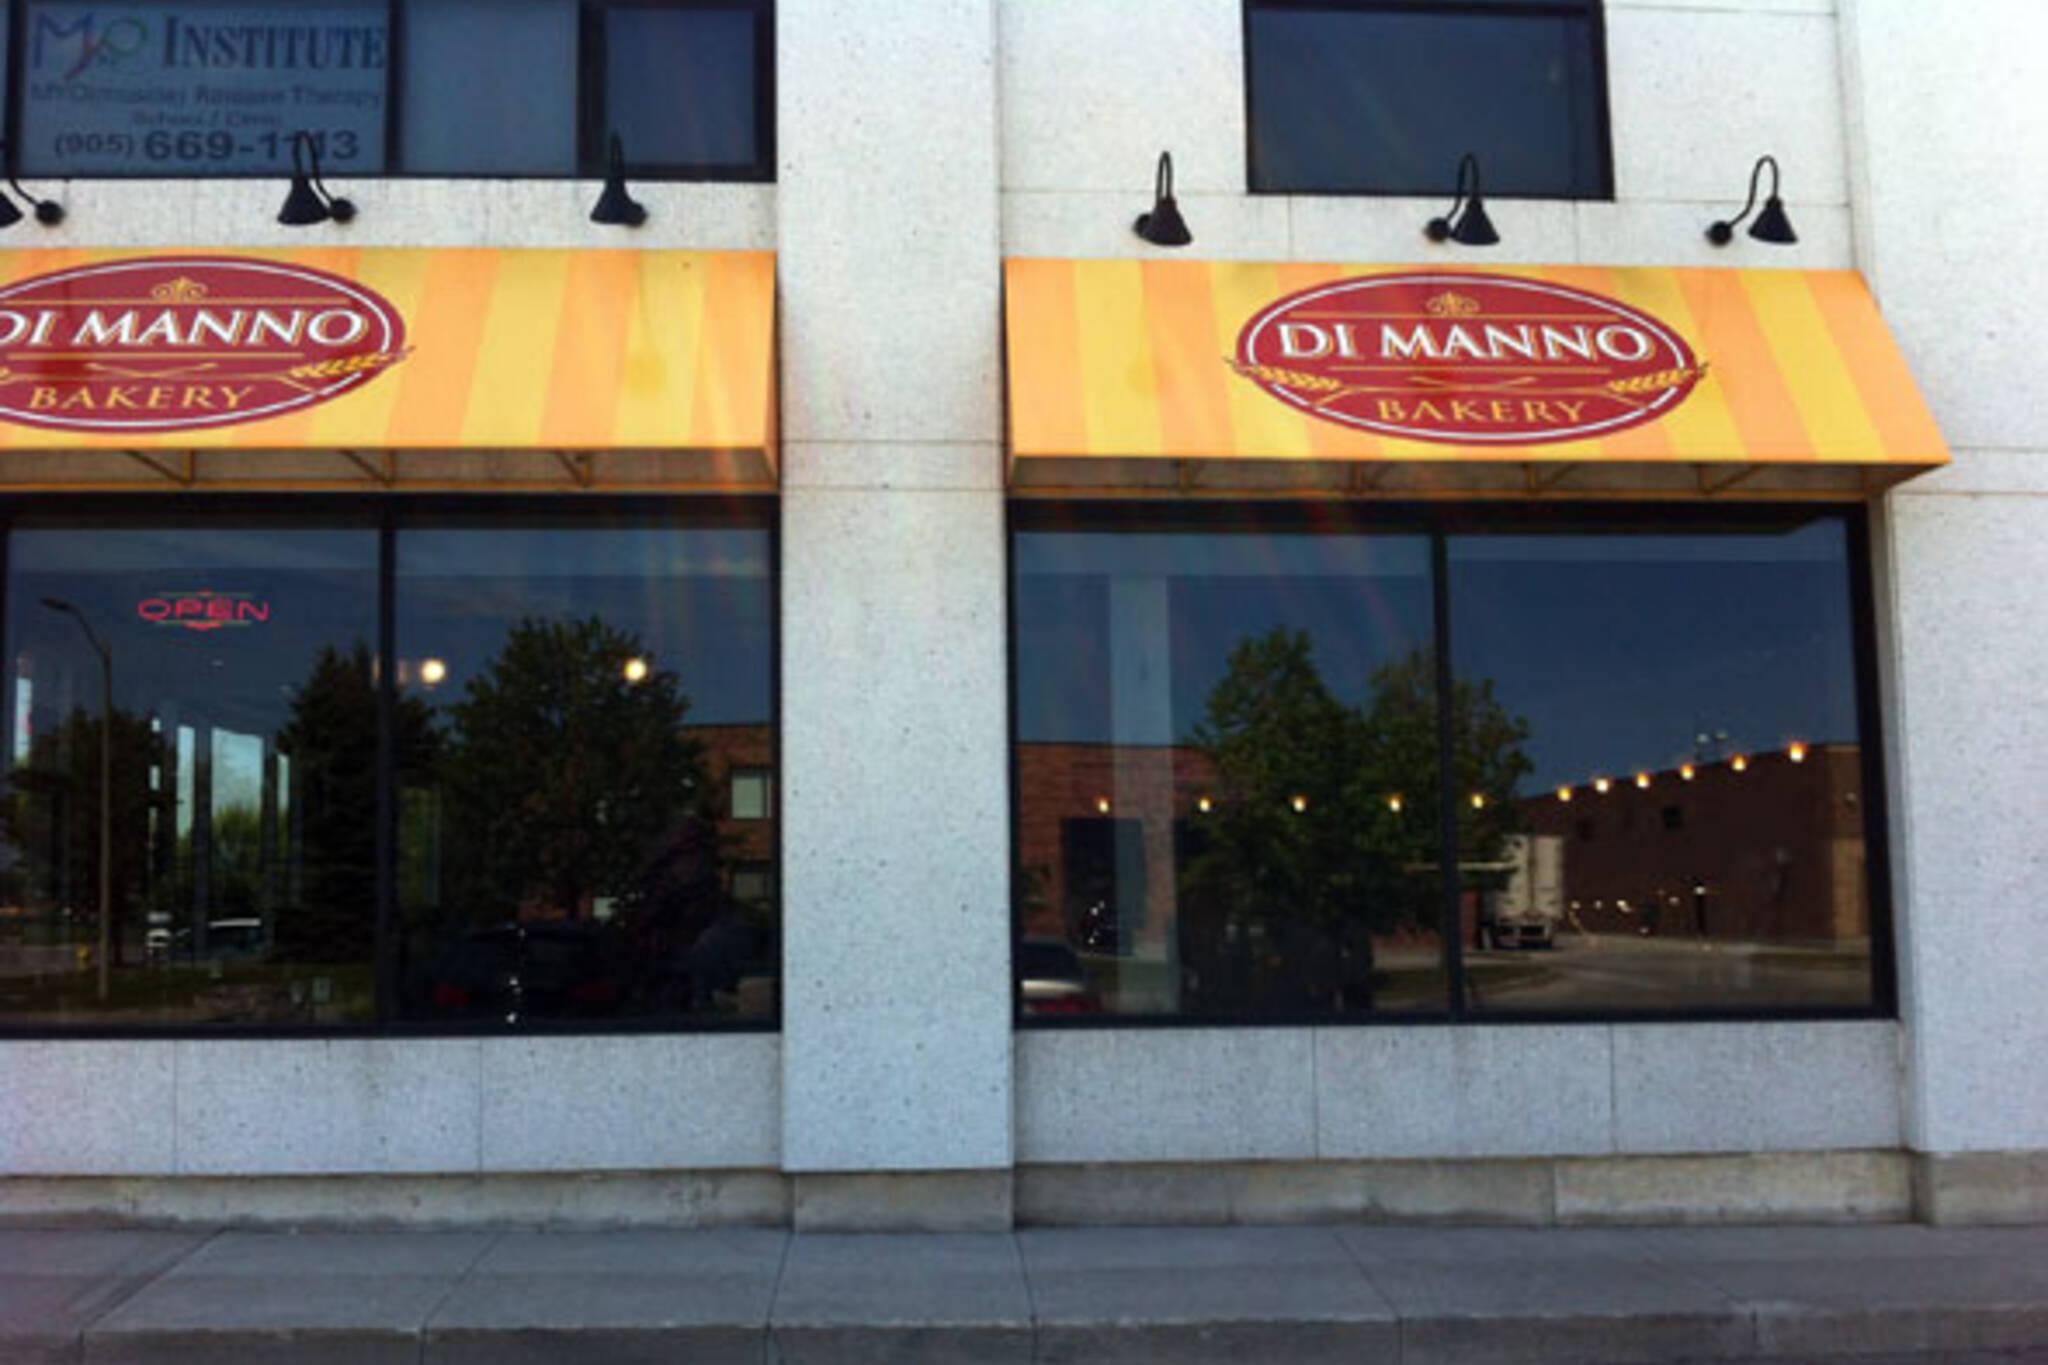 Di Manno Bakery